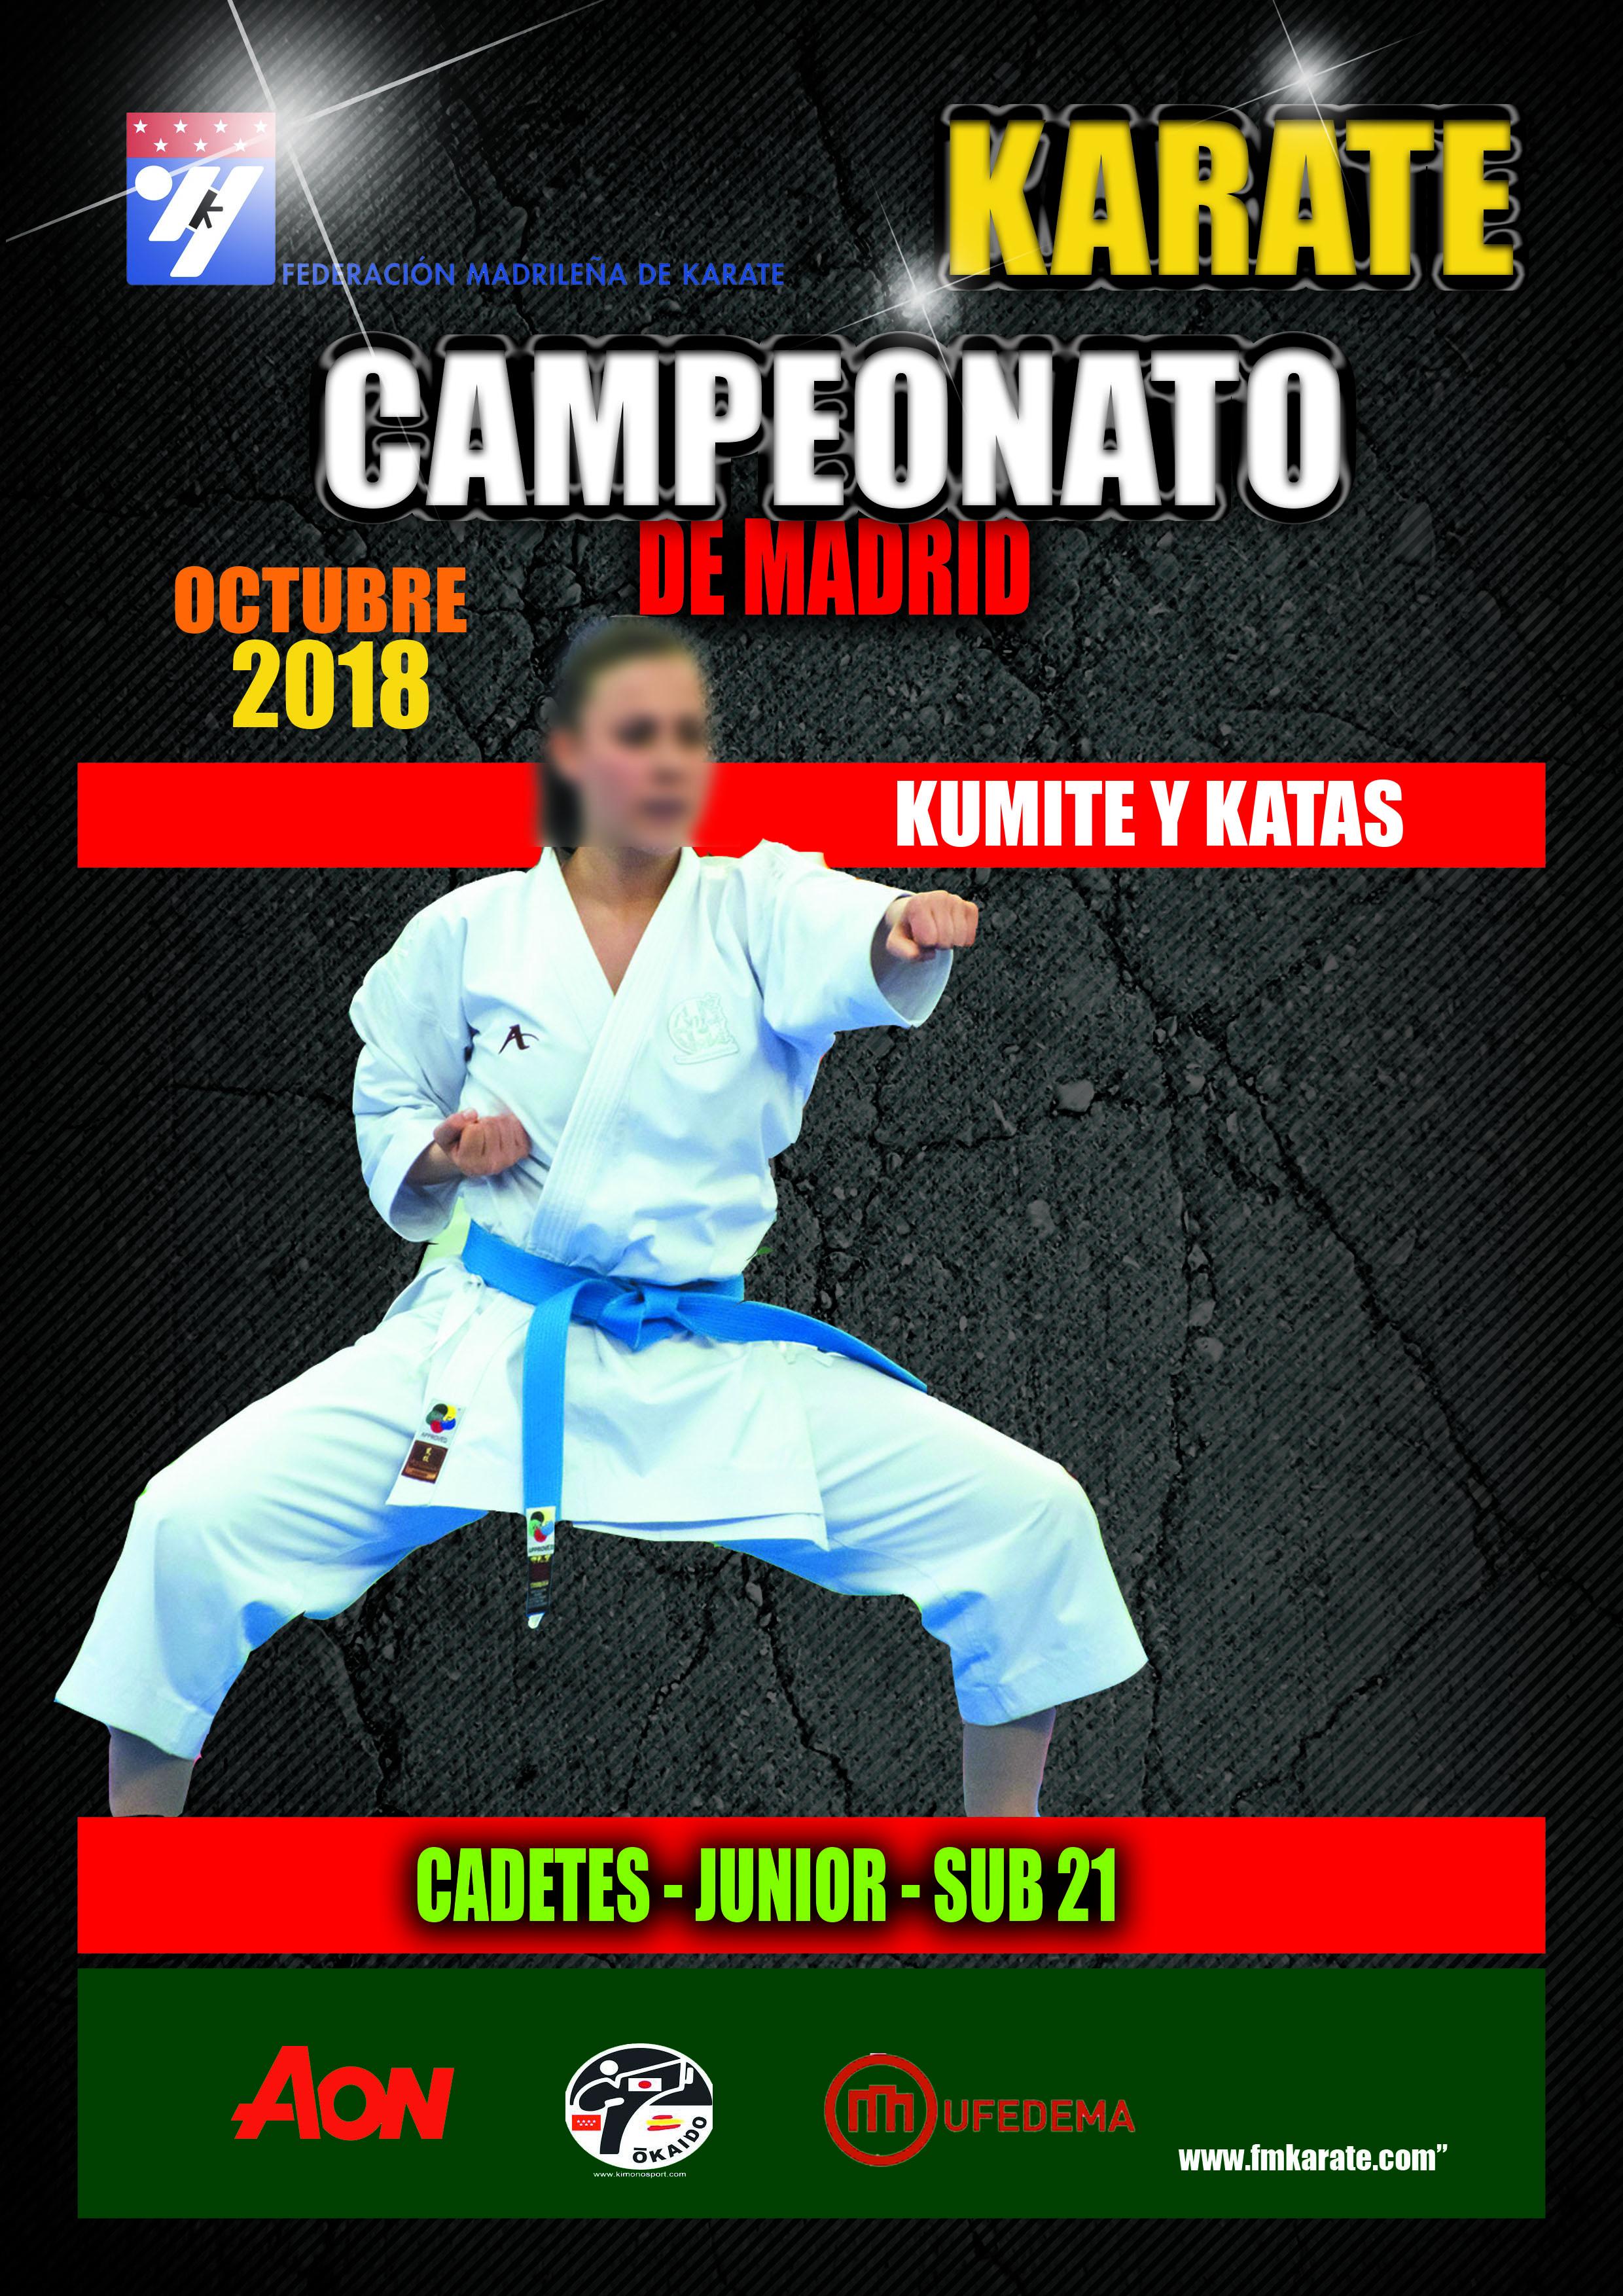 FMK Campeonato Cadete-Junior-Sub21 2018